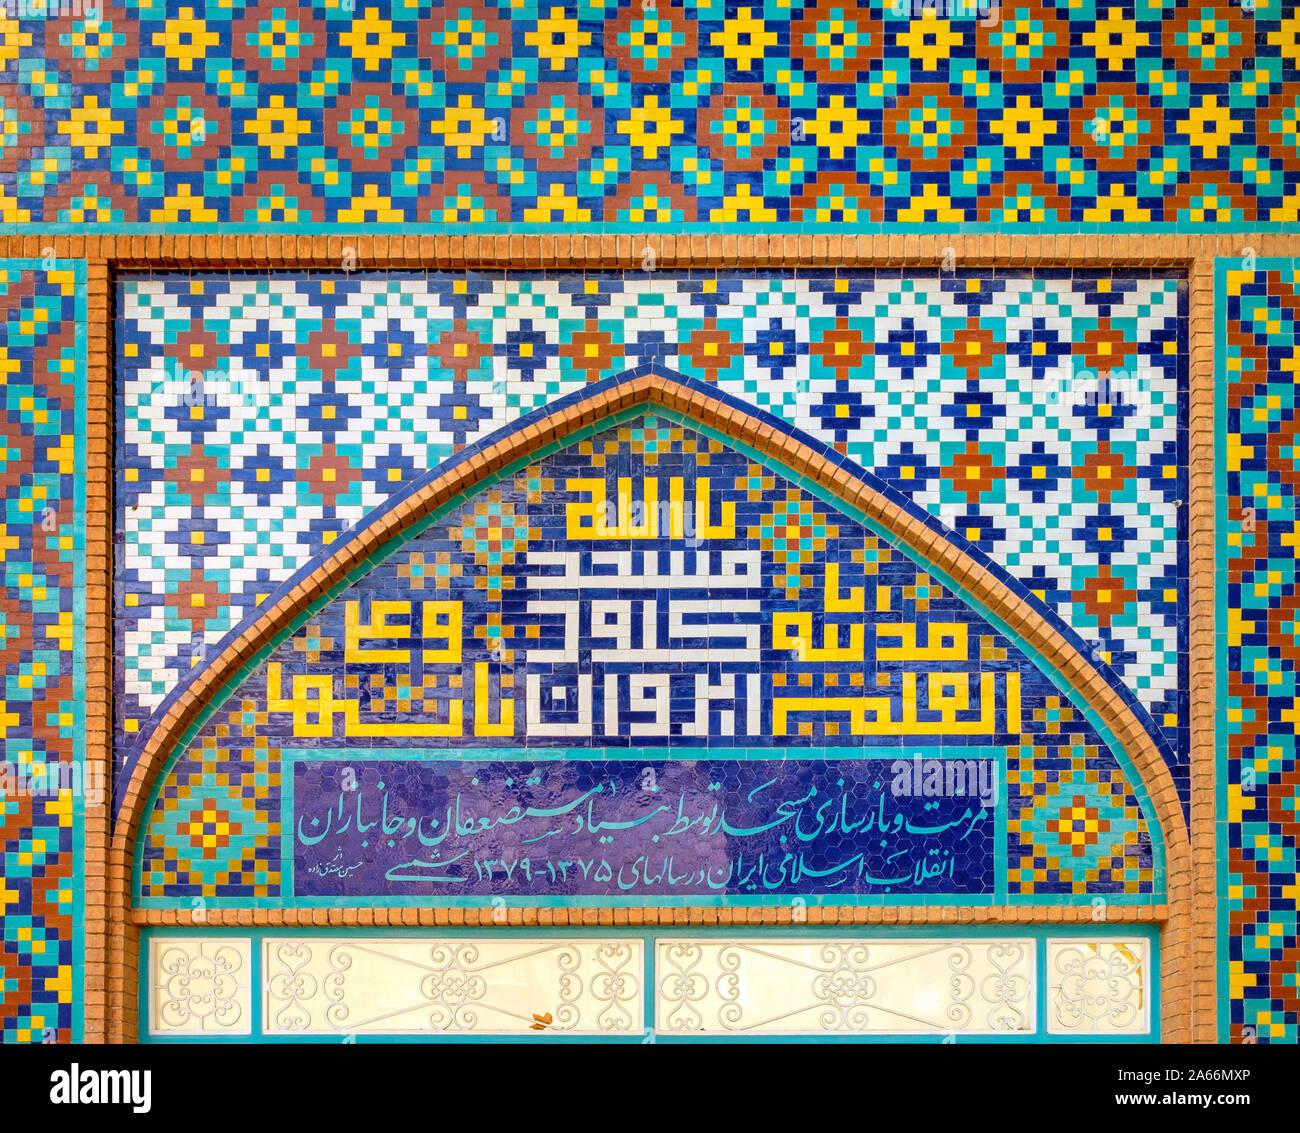 La Mezquita Azul (detalle), 18th-century mezquita chiíta en Ereván, Armenia. Foto de stock